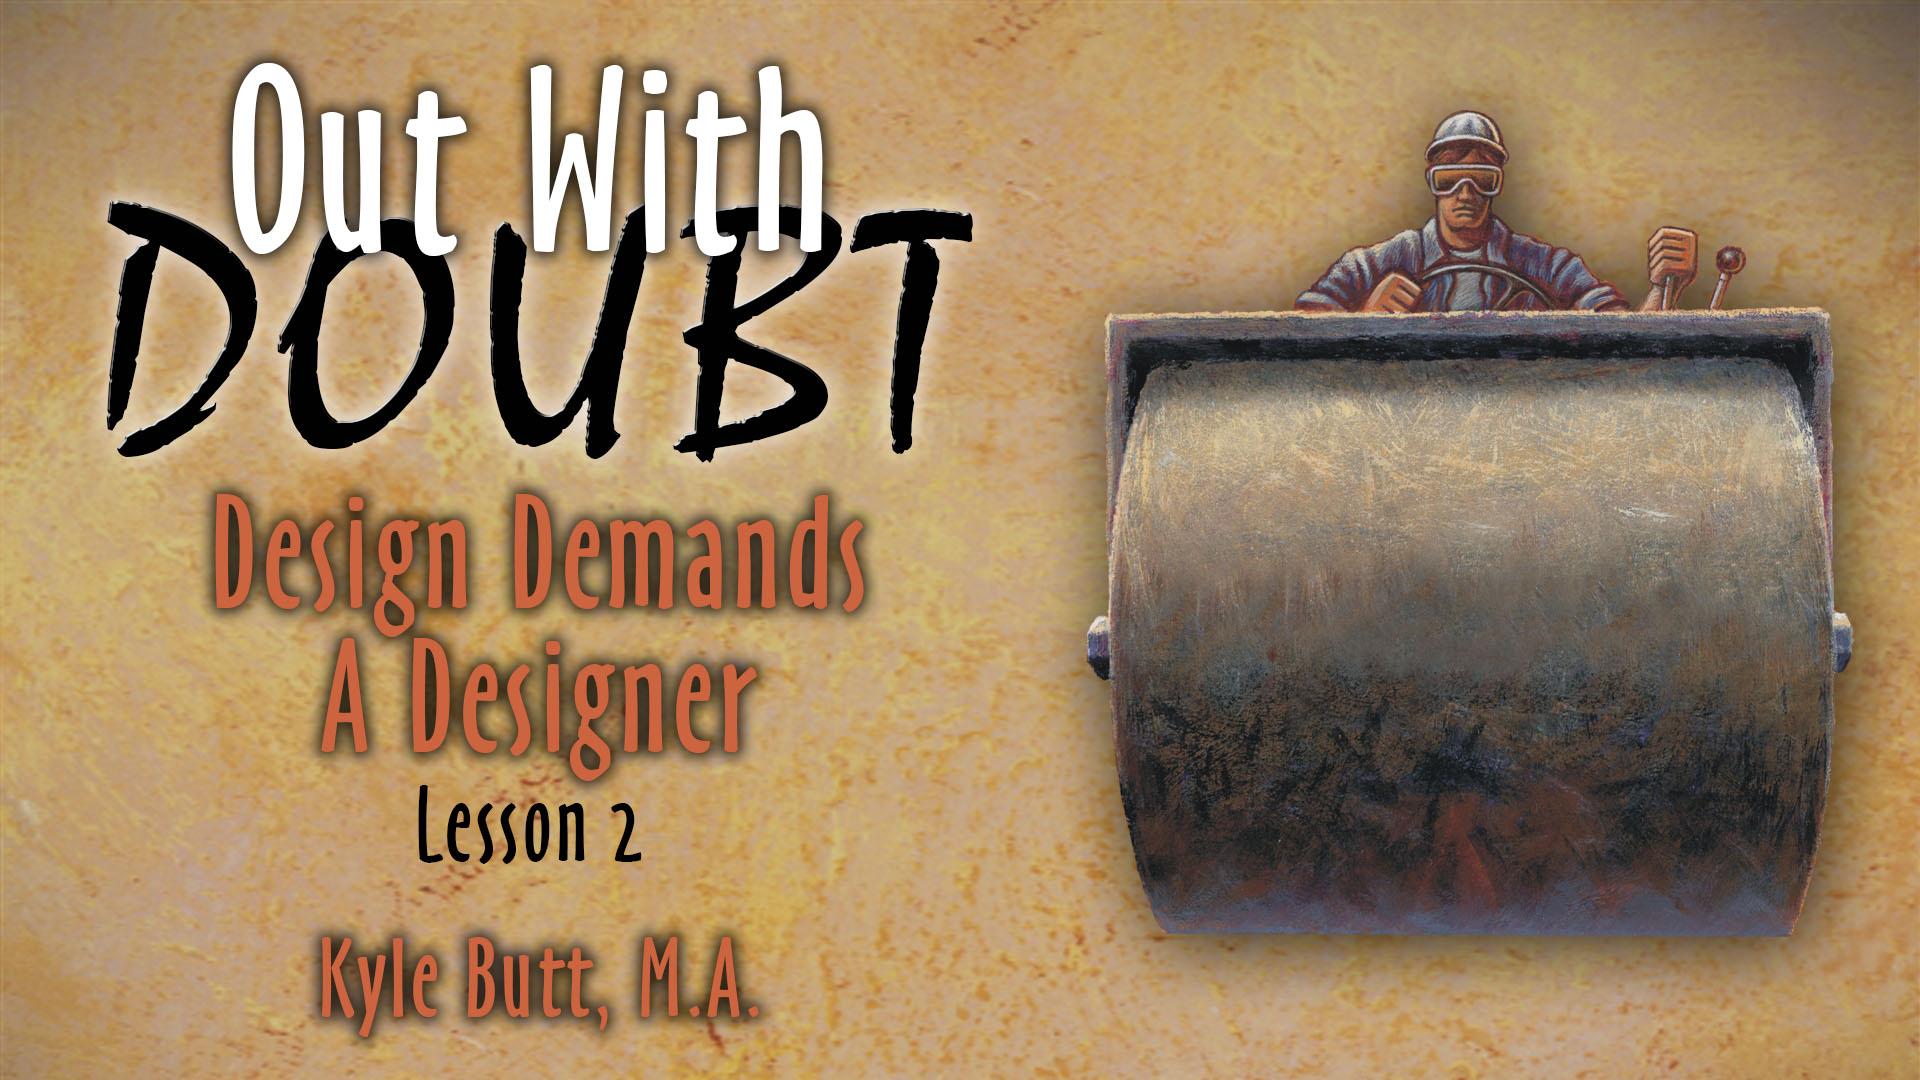 2. Design Demands a Designer | Out With Doubt